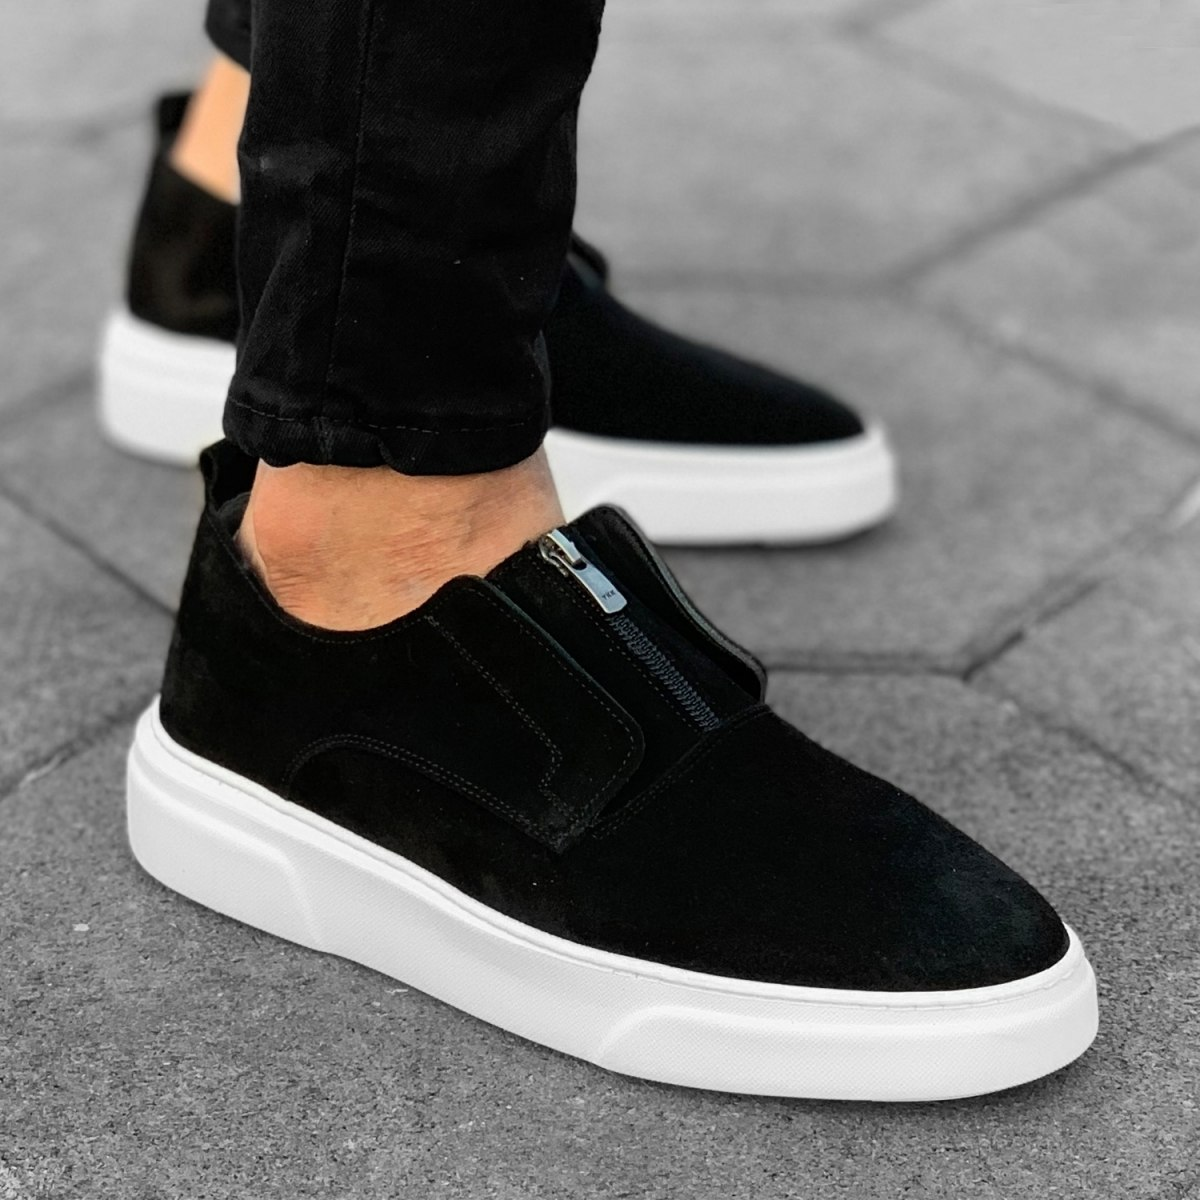 Homem Pele Designer Camurça Sneakers Basket Preto-Branco